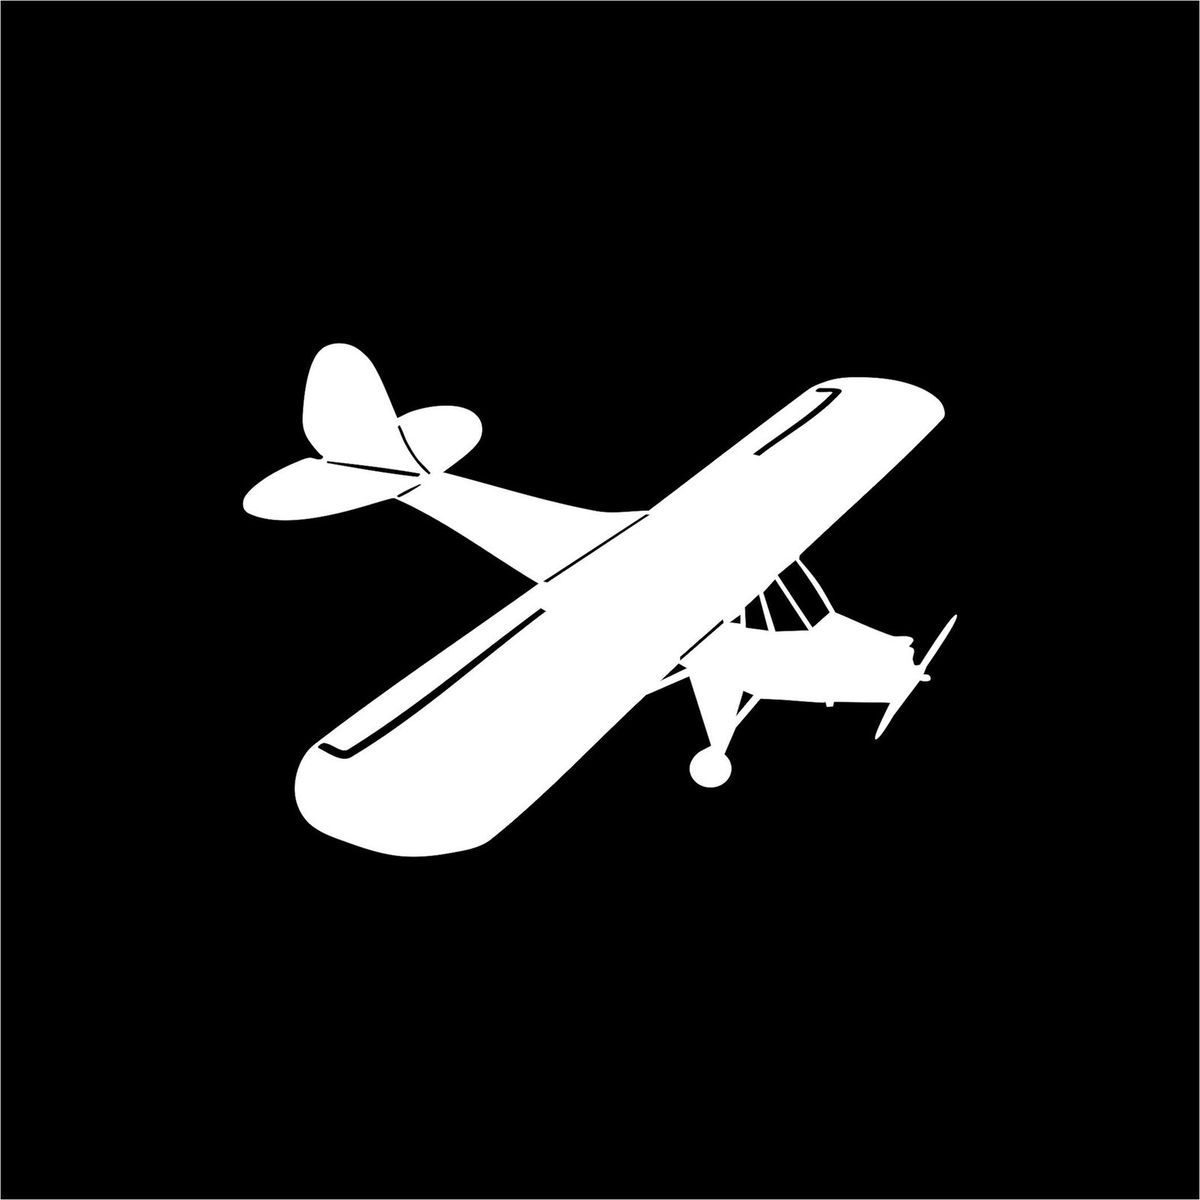 Airplane piper cub white vinyl car window sticker decal large